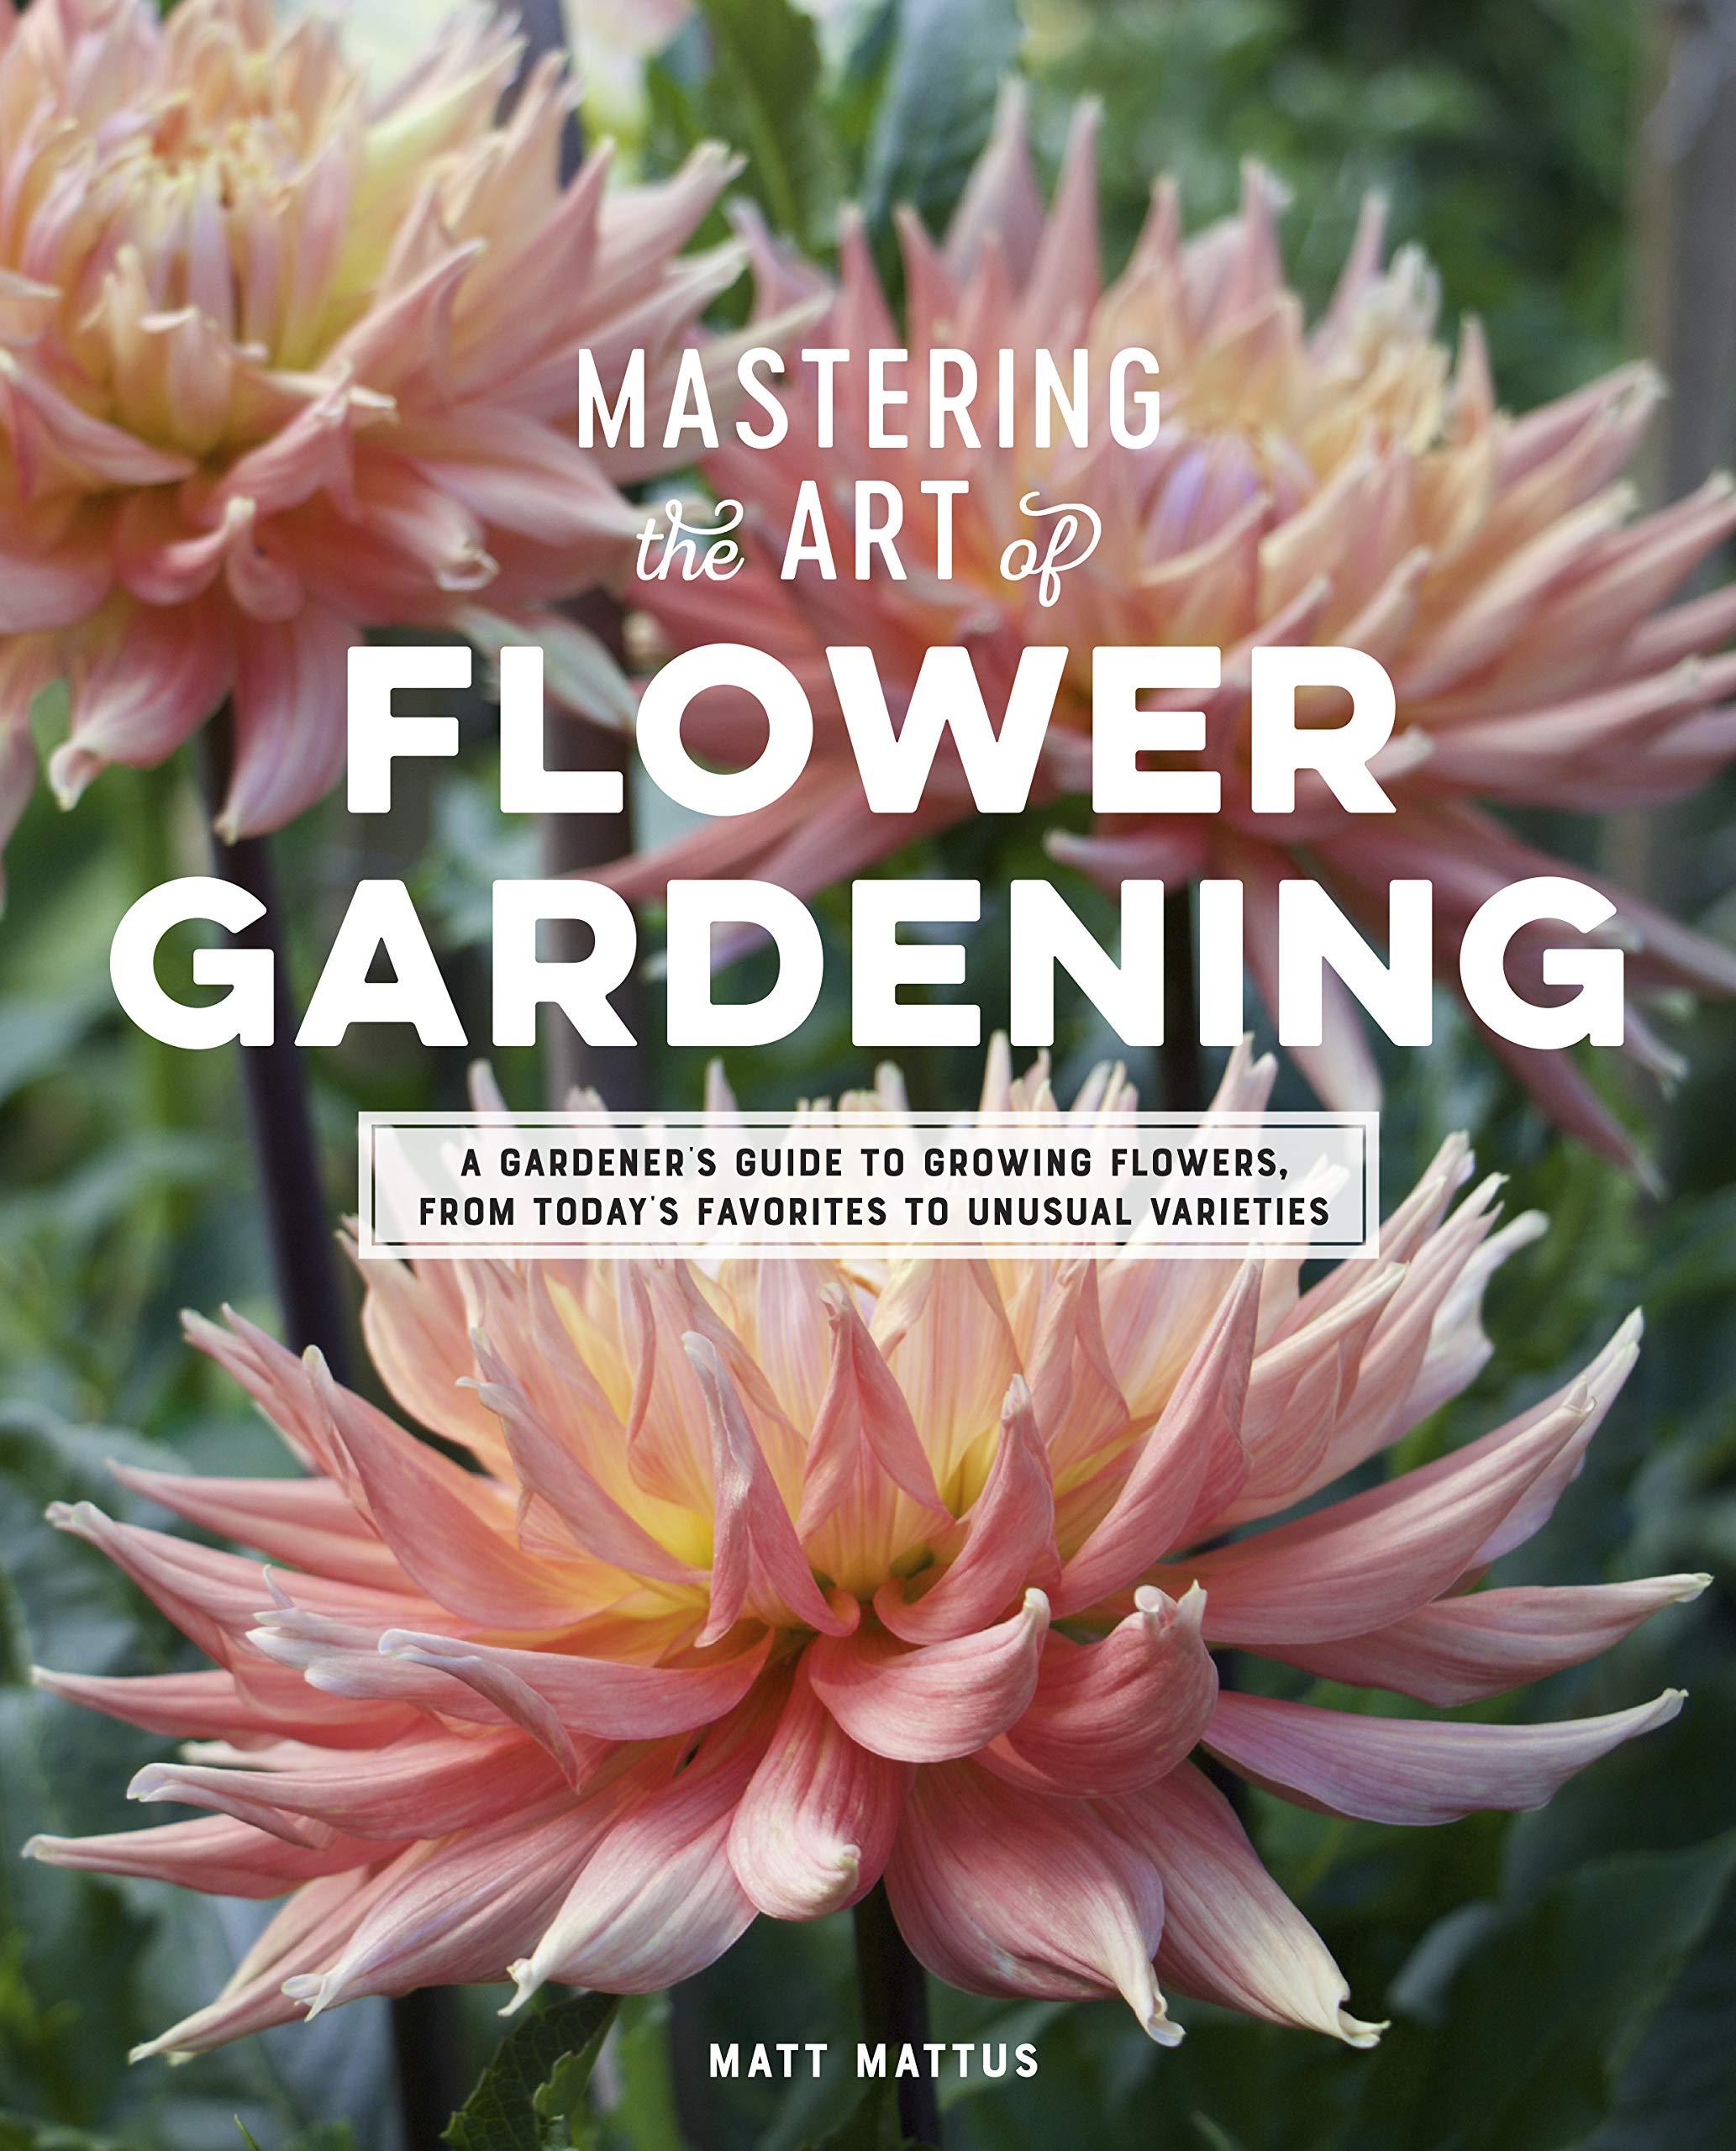 Mastering The Art Of Flower Gardening A Gardener S Guide To Growing Flowers From Today S Favorites To Unusual Varieties Mattus Matt 9780760366271 Amazon Com Books